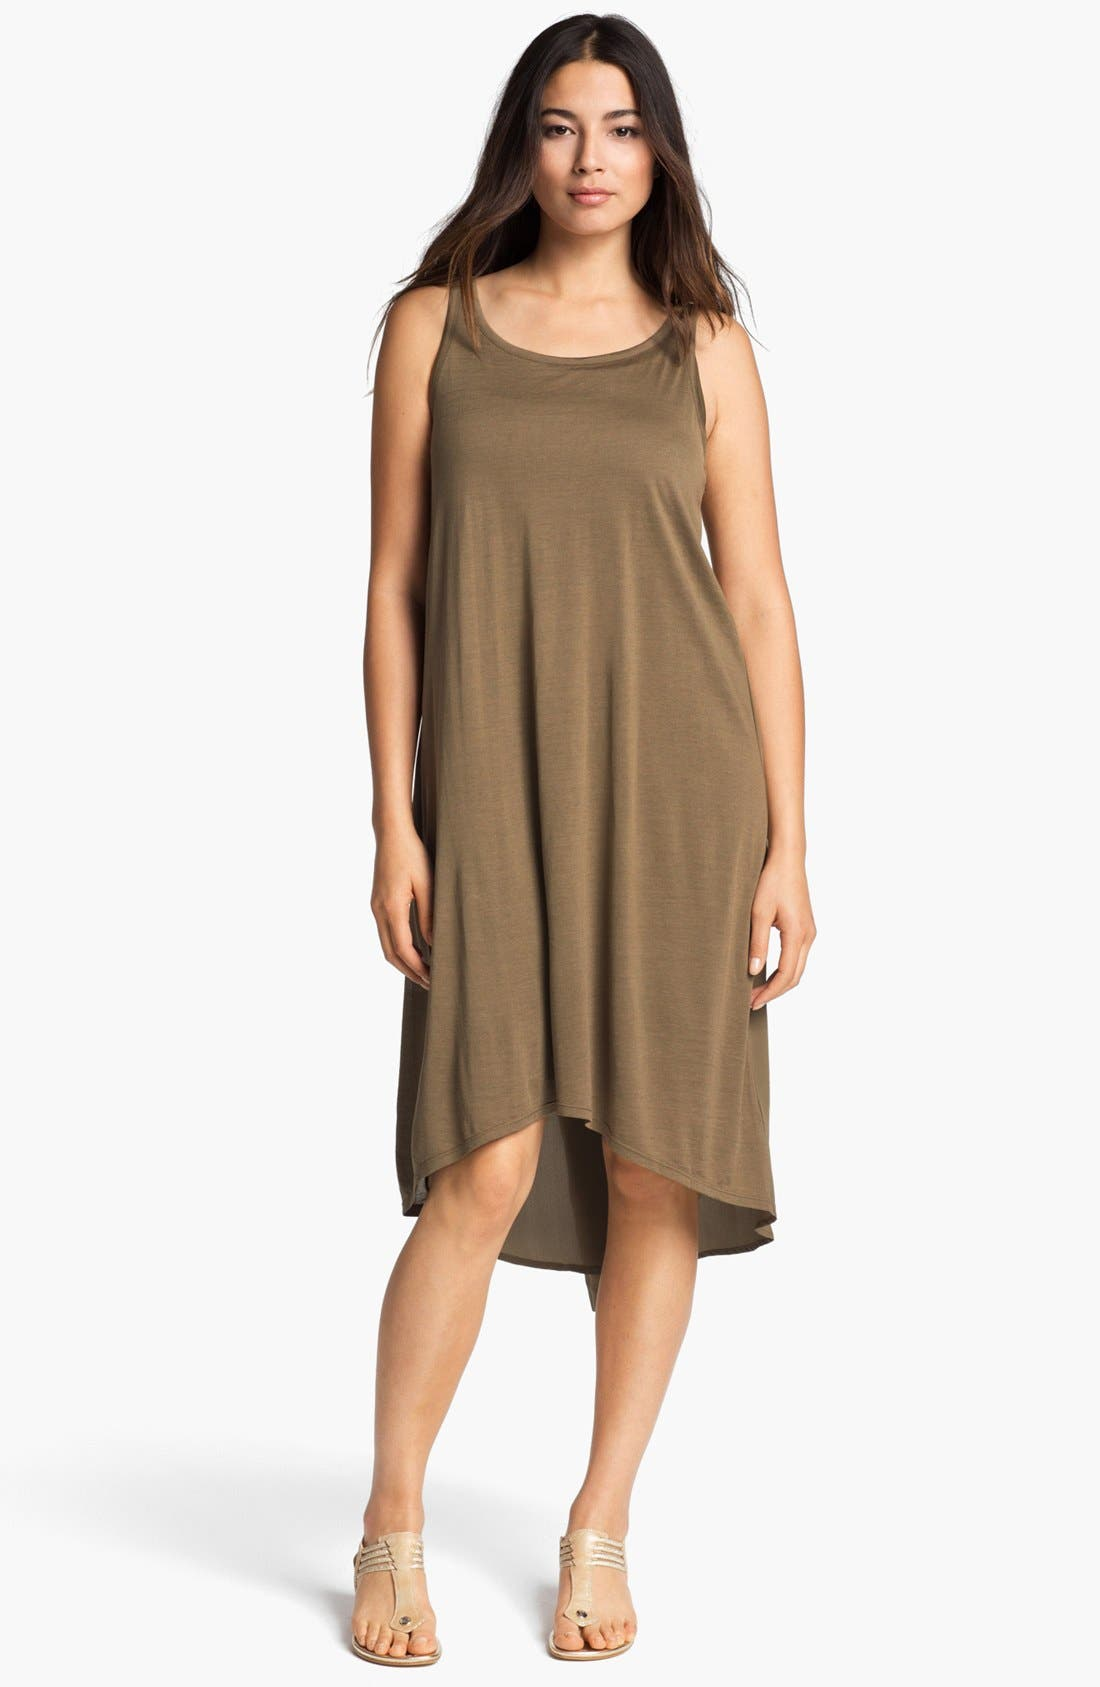 Alternate Image 1 Selected - Eileen Fisher Scoop Neck Flared Dress